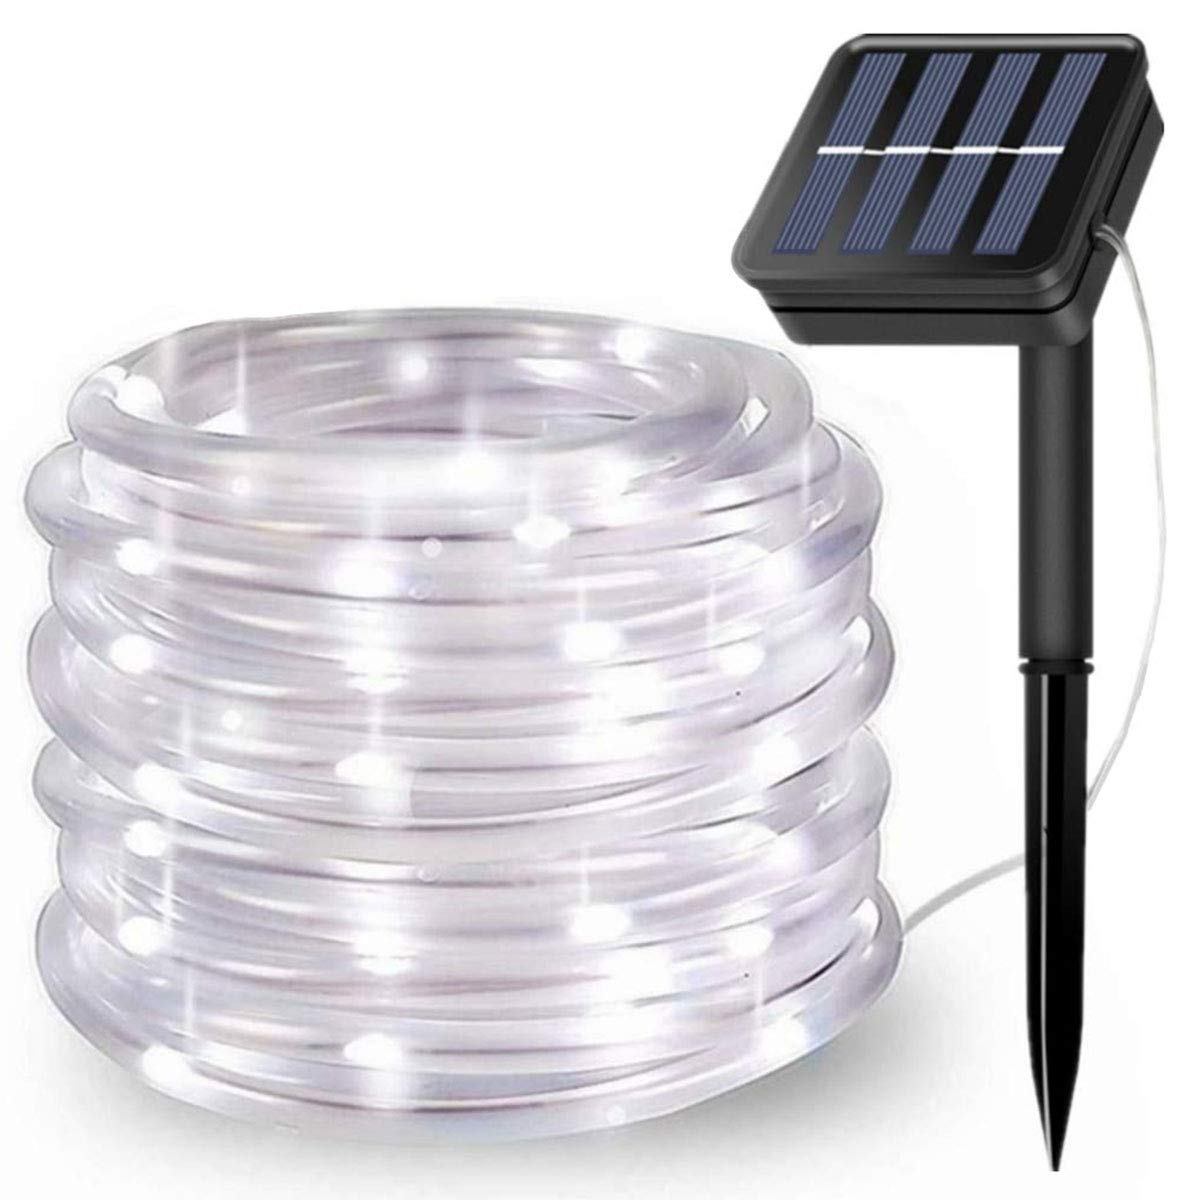 LiyuanQ Solar Rope Lights 100LEDs